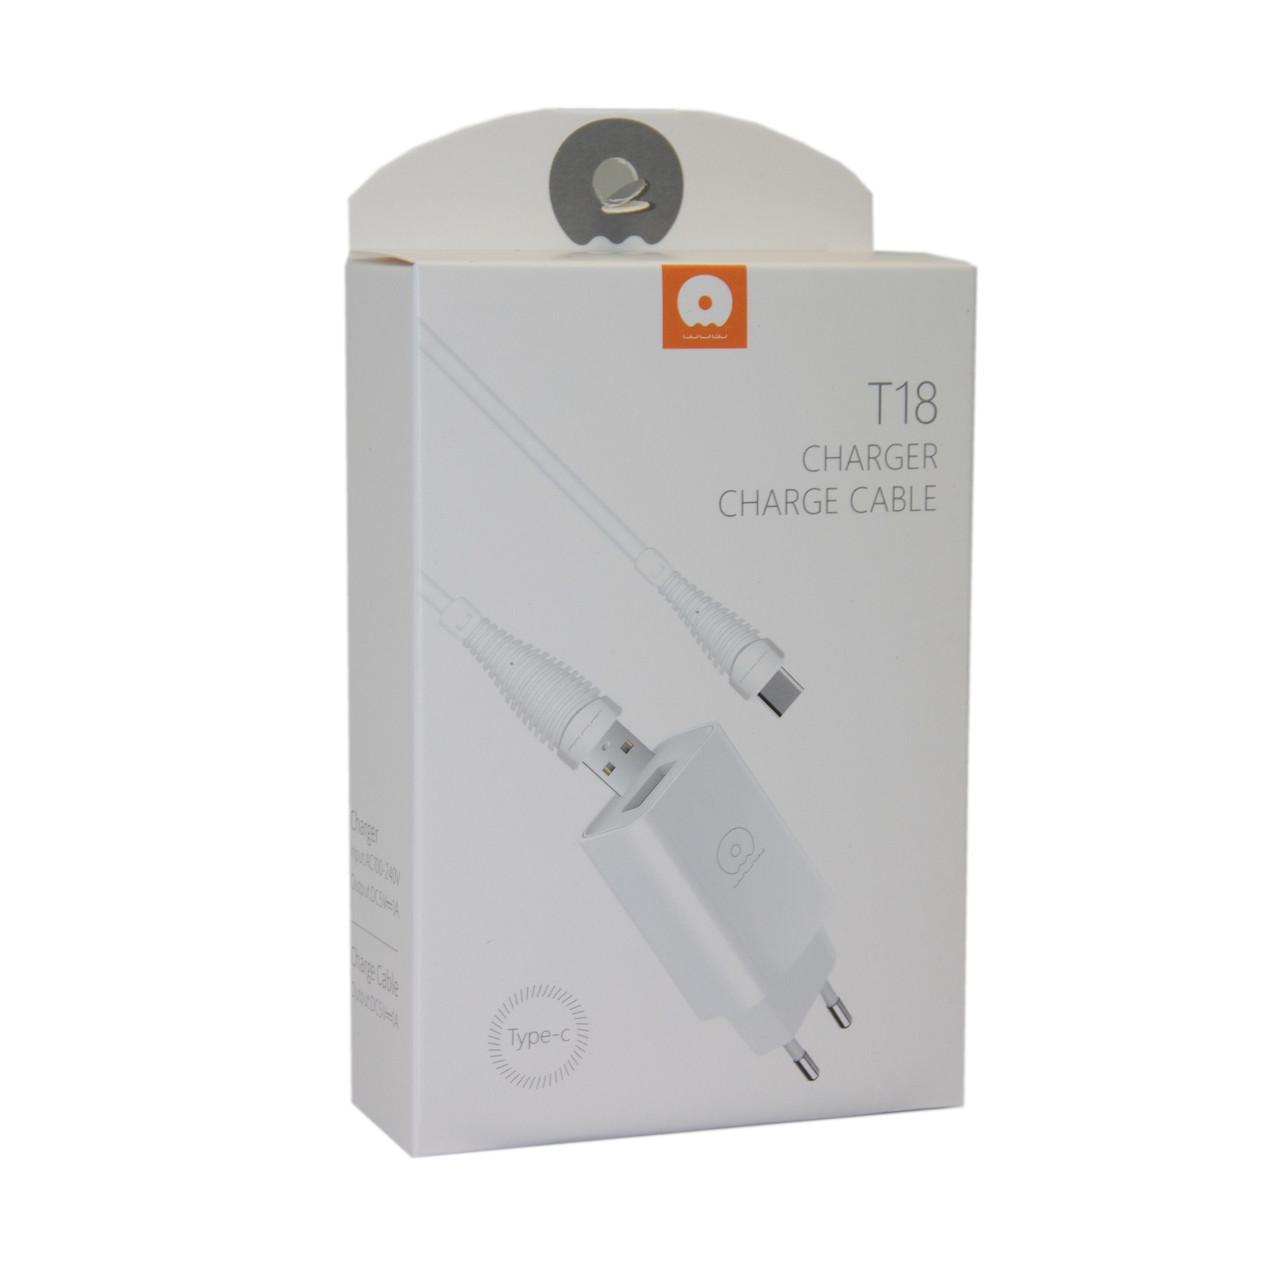 Зарядное устройство WUW T18 Lightning Apple iPhone, iPad